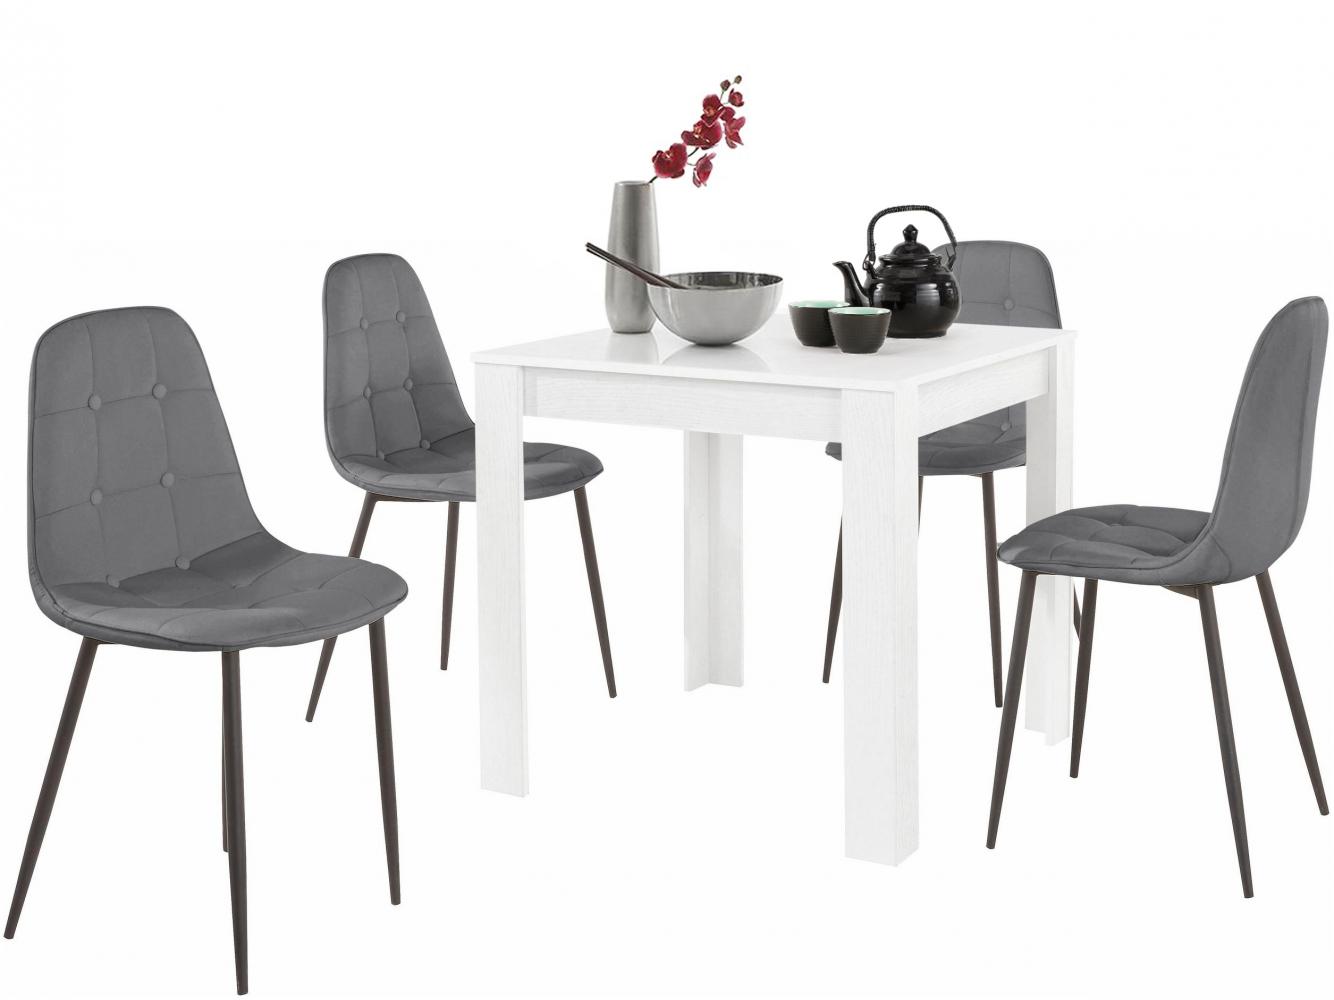 Jídelní set Lorm 4+1, 80 cm, šedá / bílá